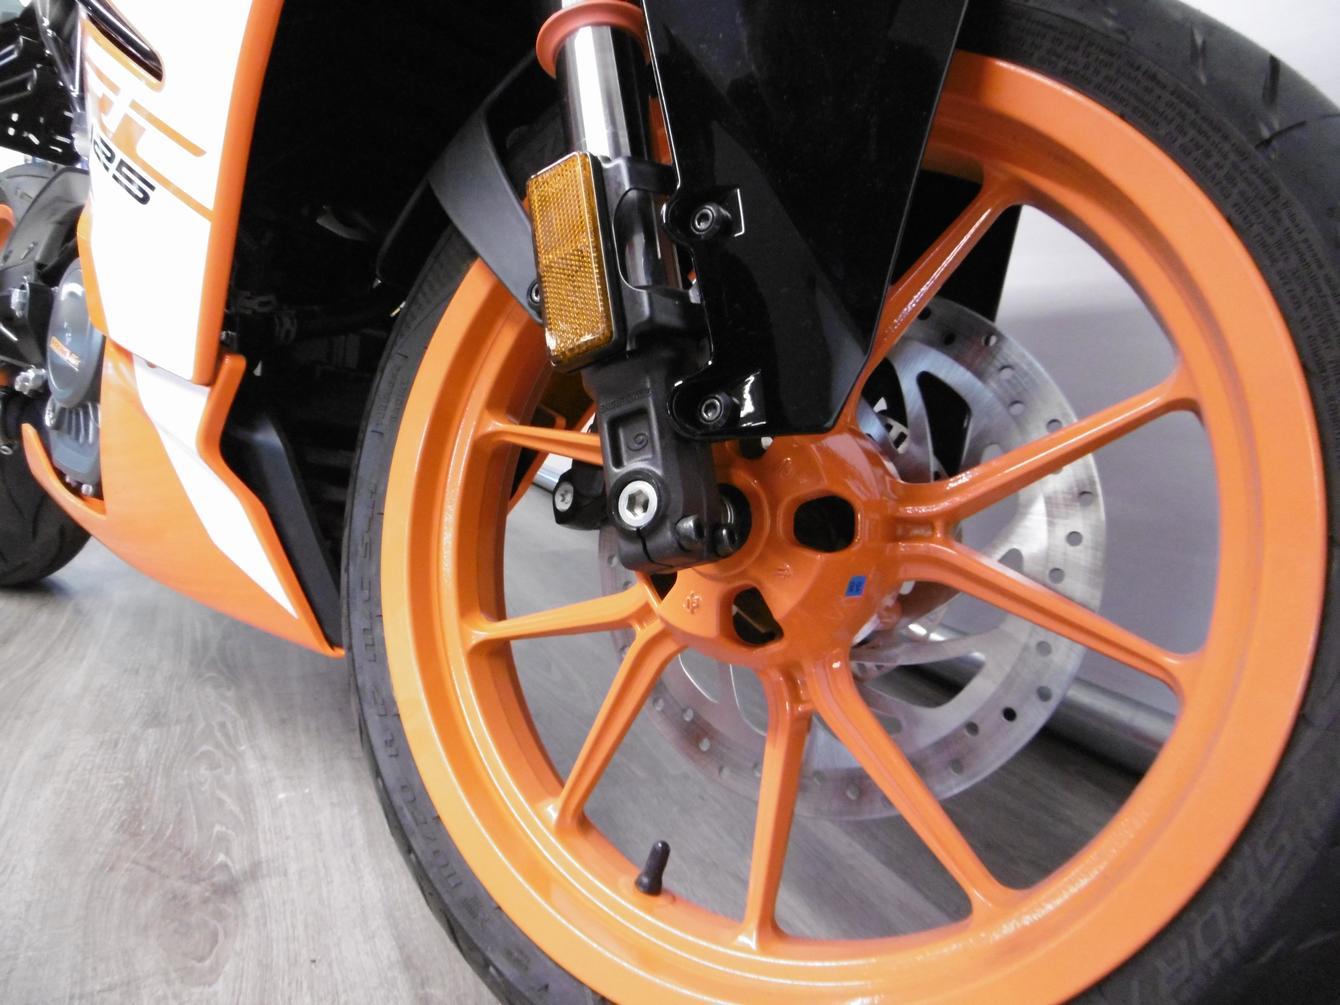 KTM - RC 125 ABS